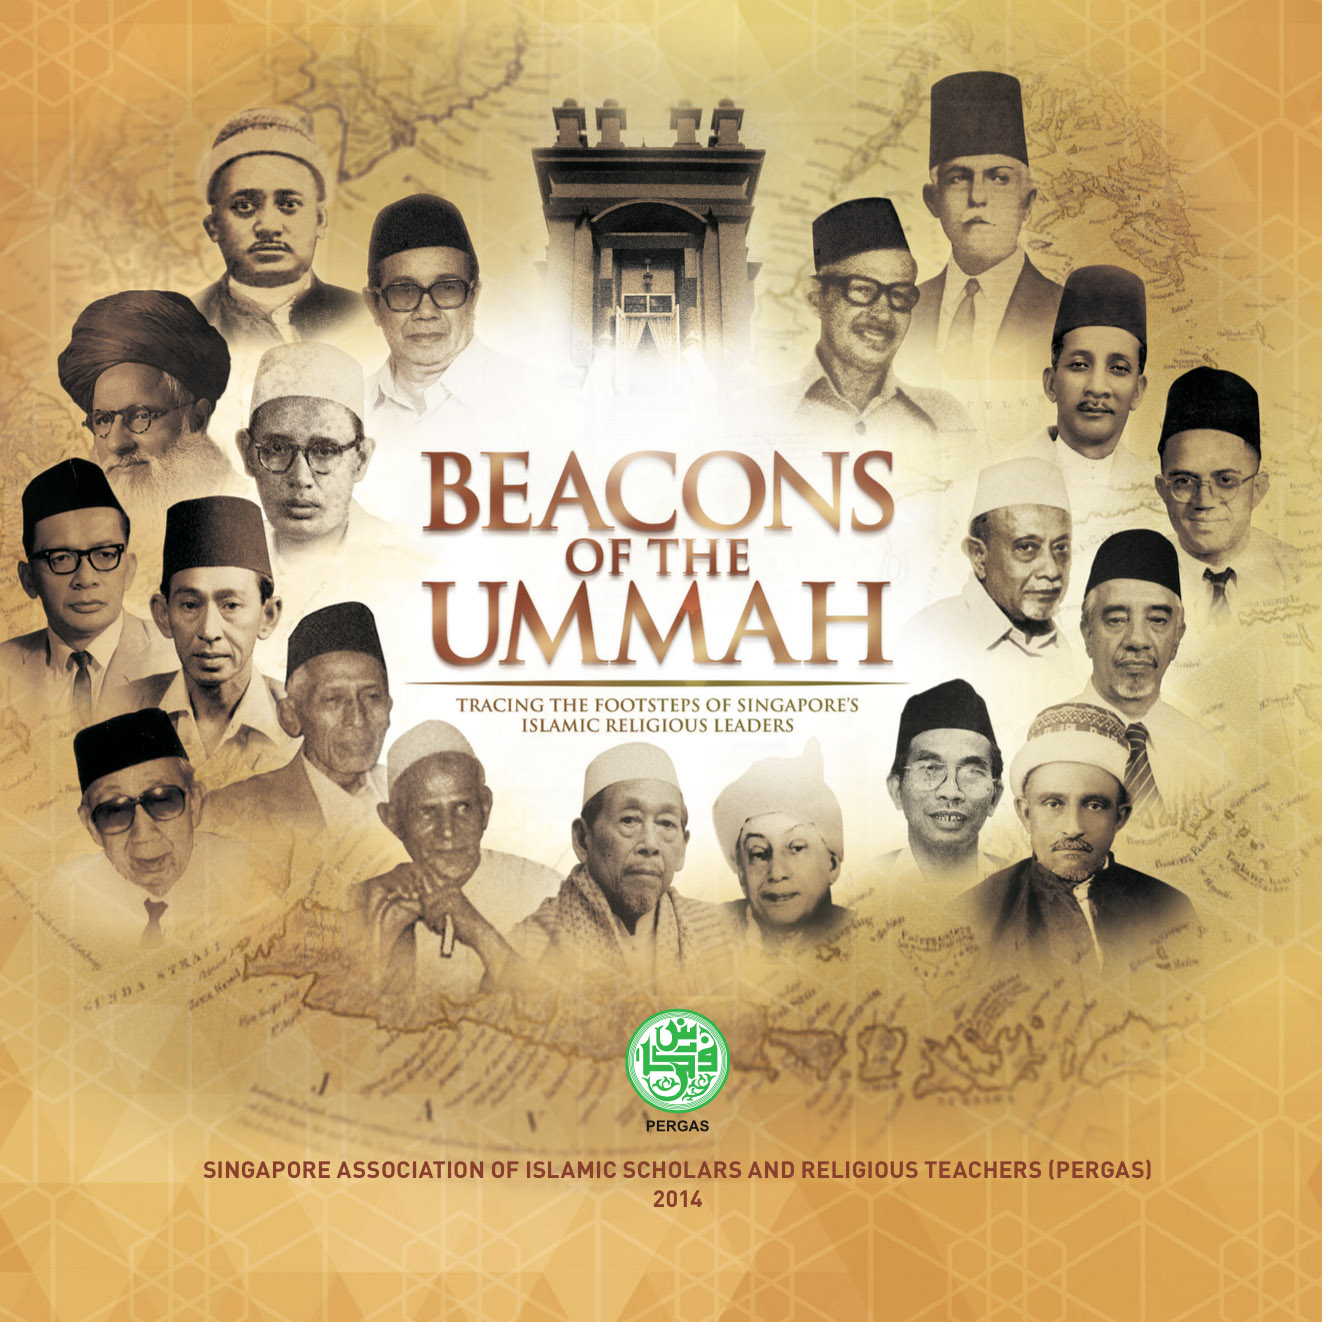 Beacons of the Ummah